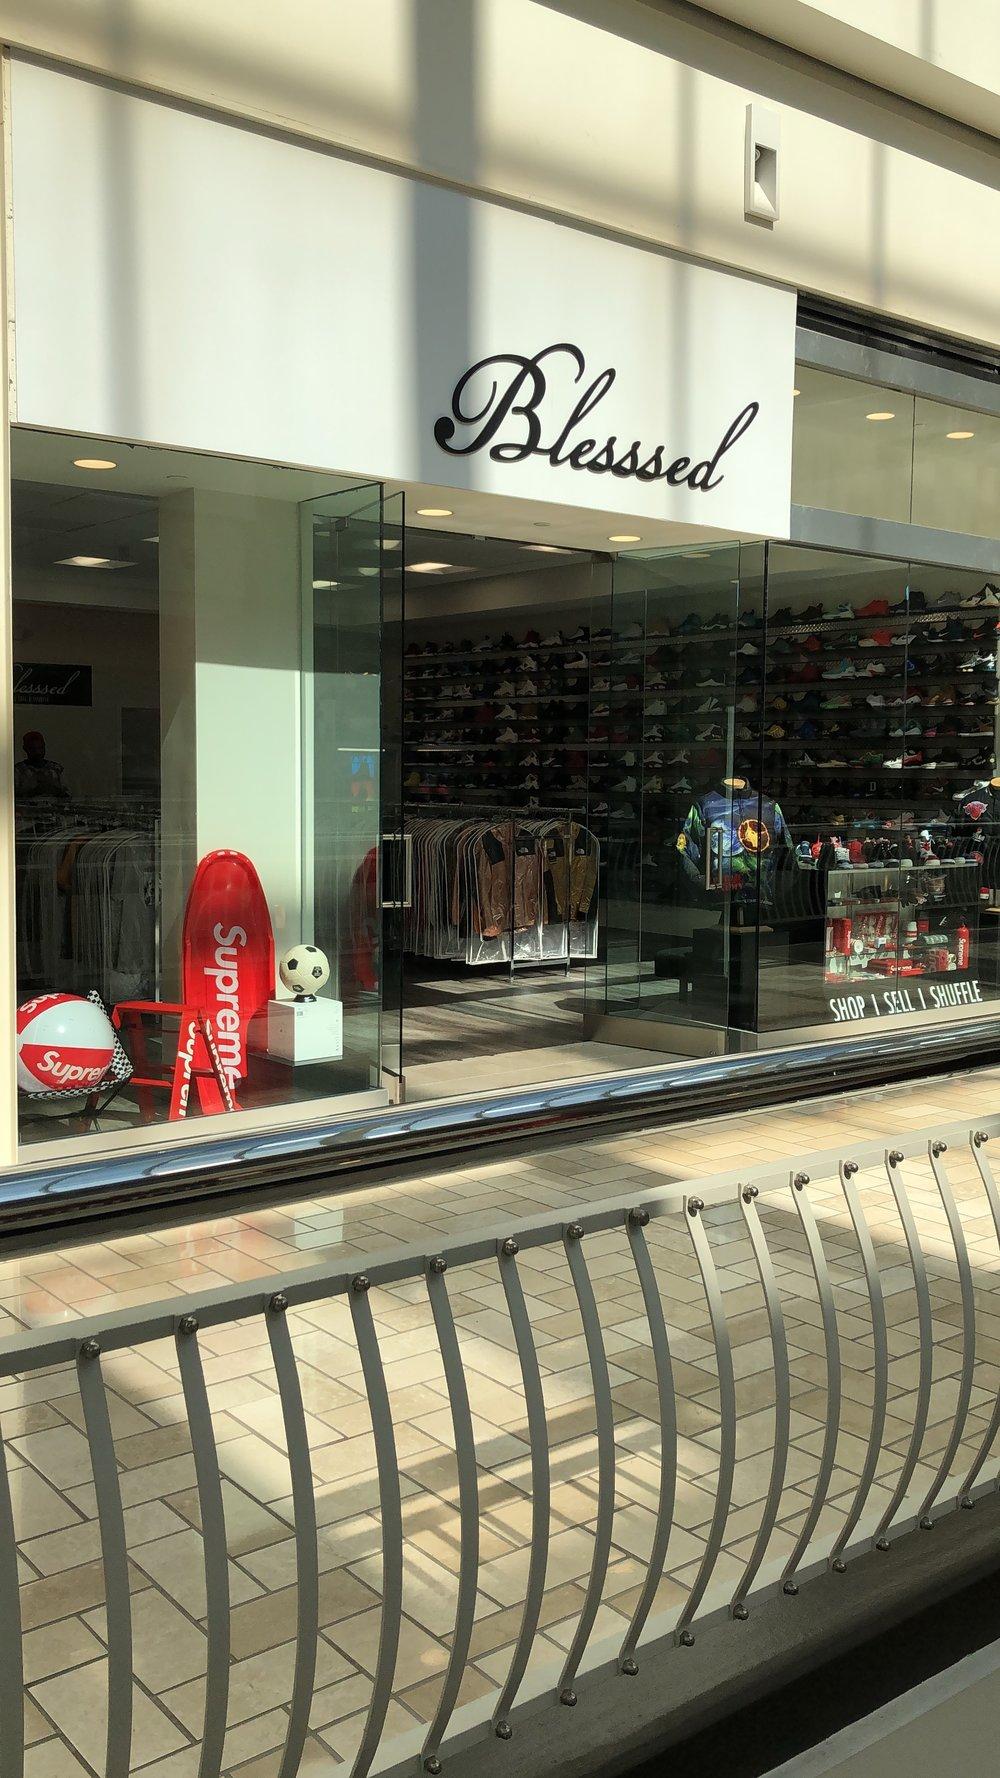 blesssed store.jpg